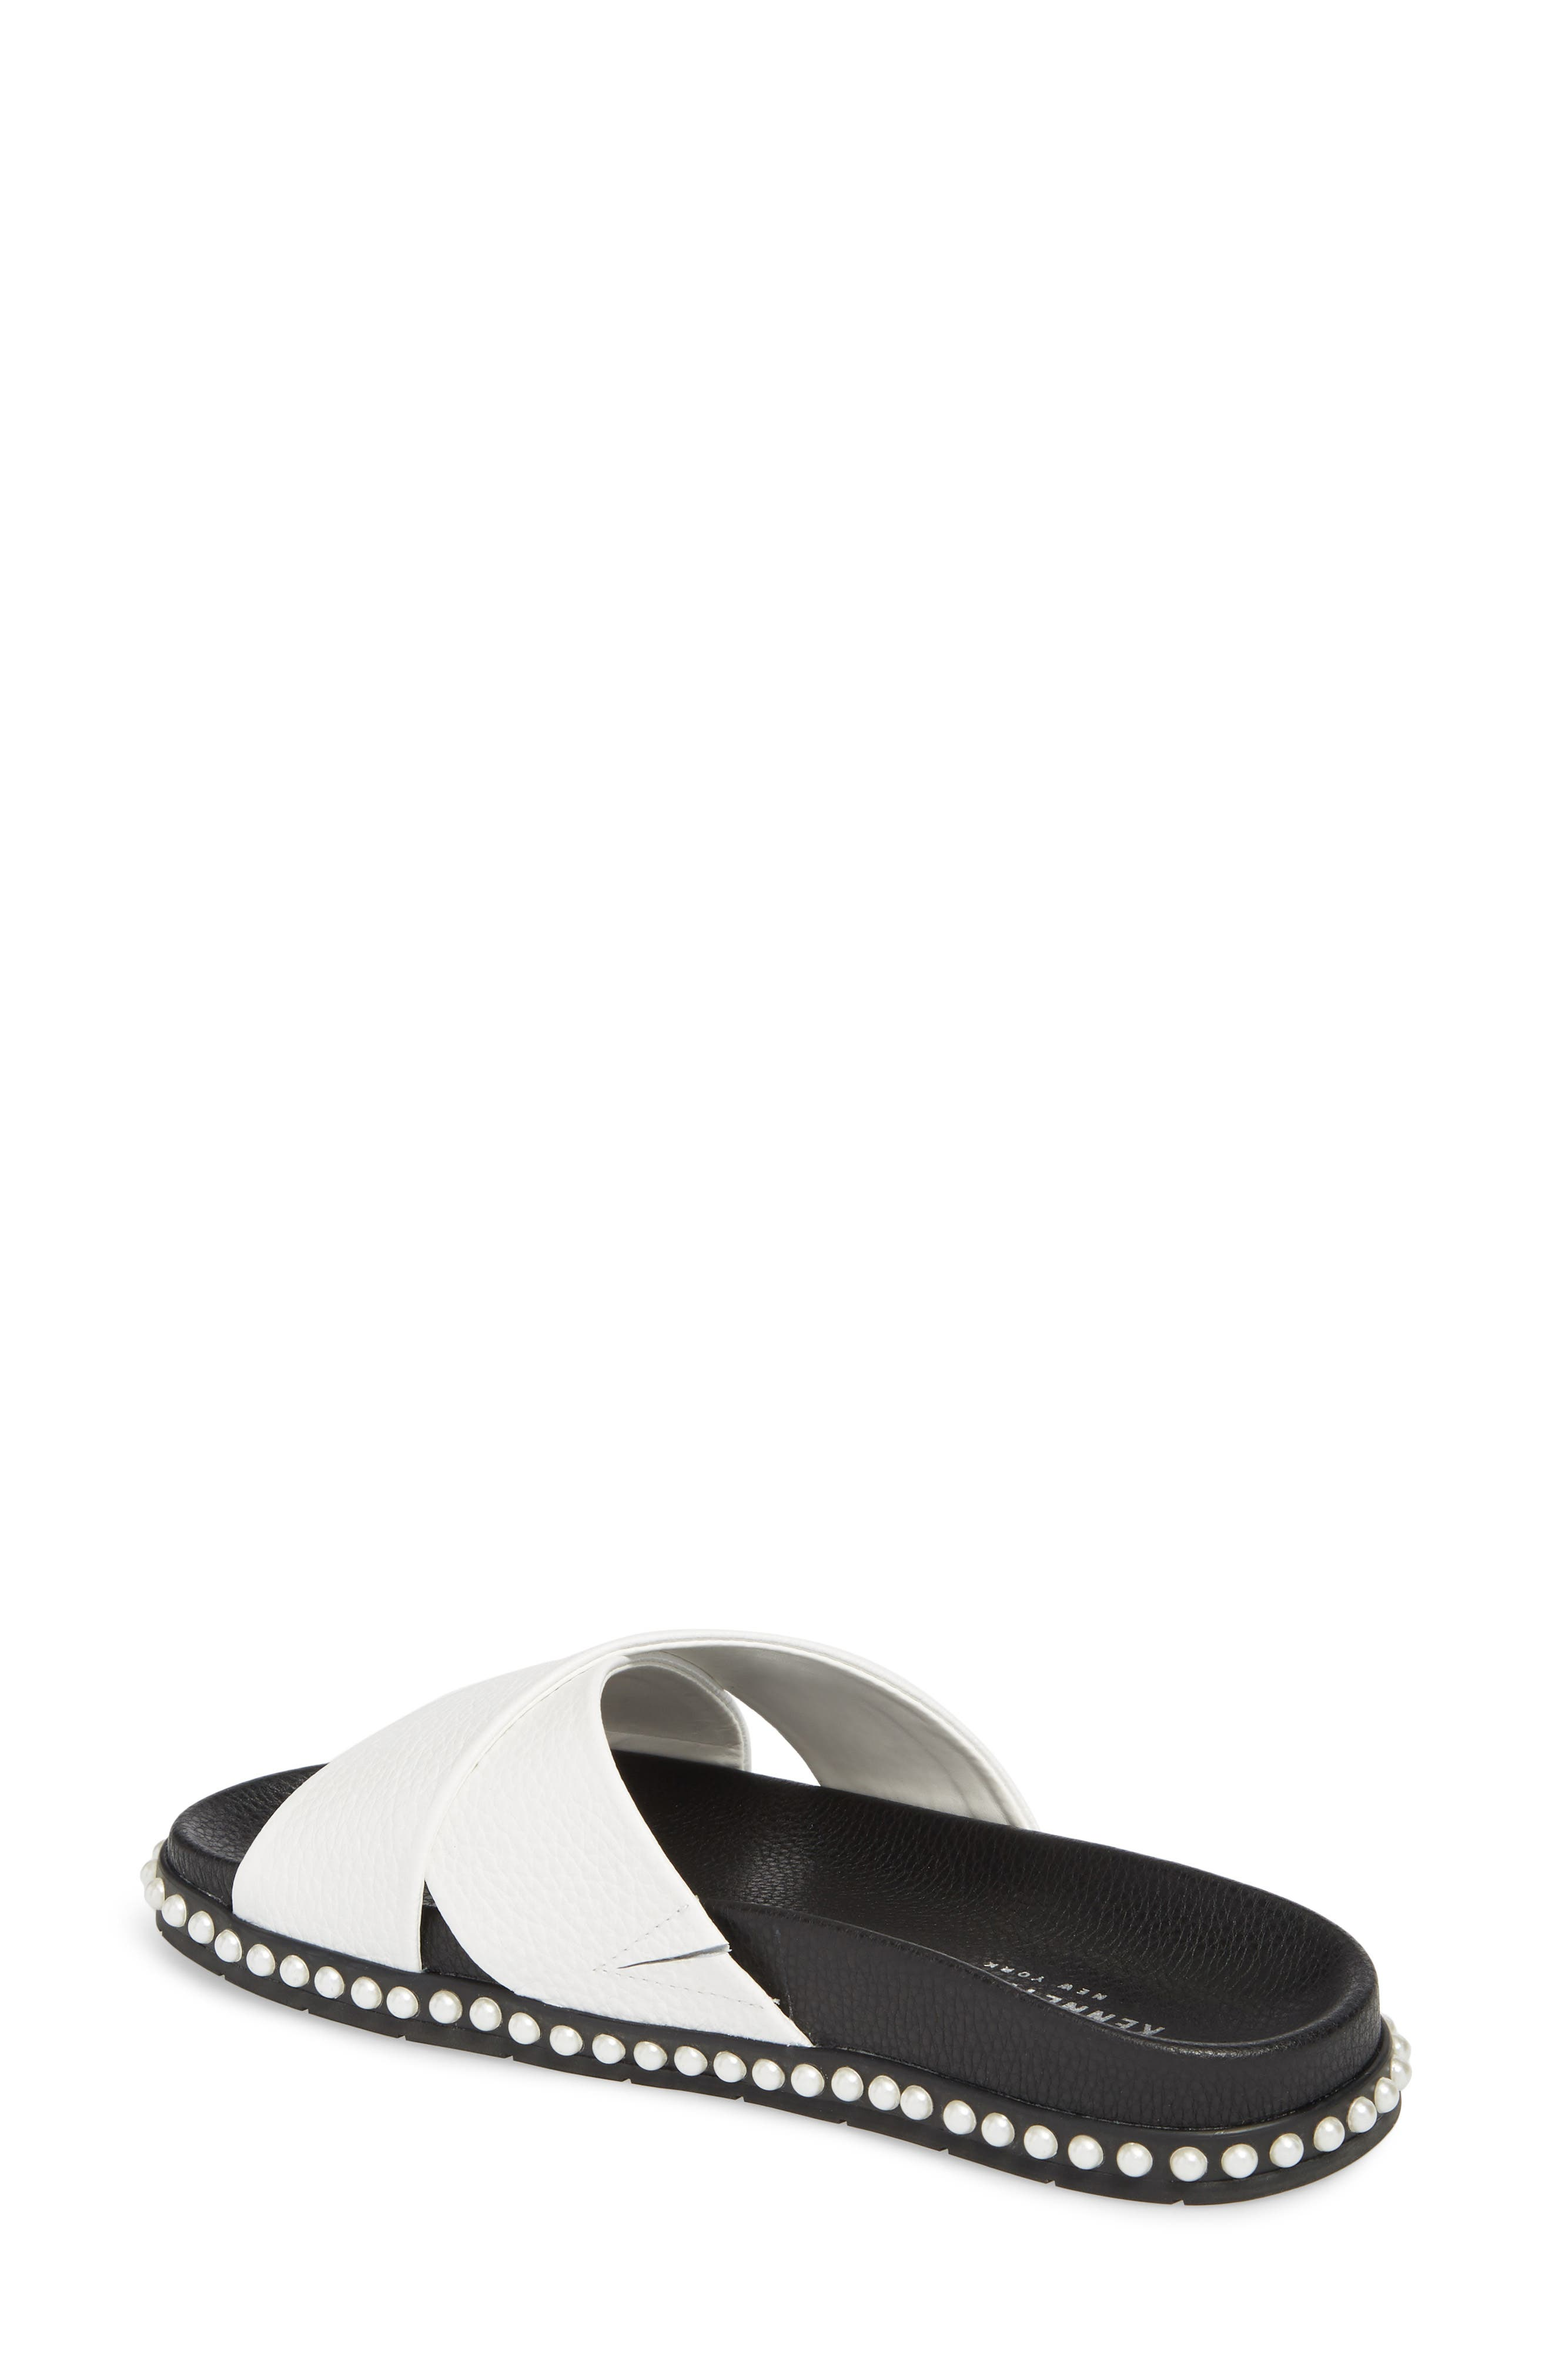 Xiomana Slide Sandal,                             Alternate thumbnail 2, color,                             White Leather